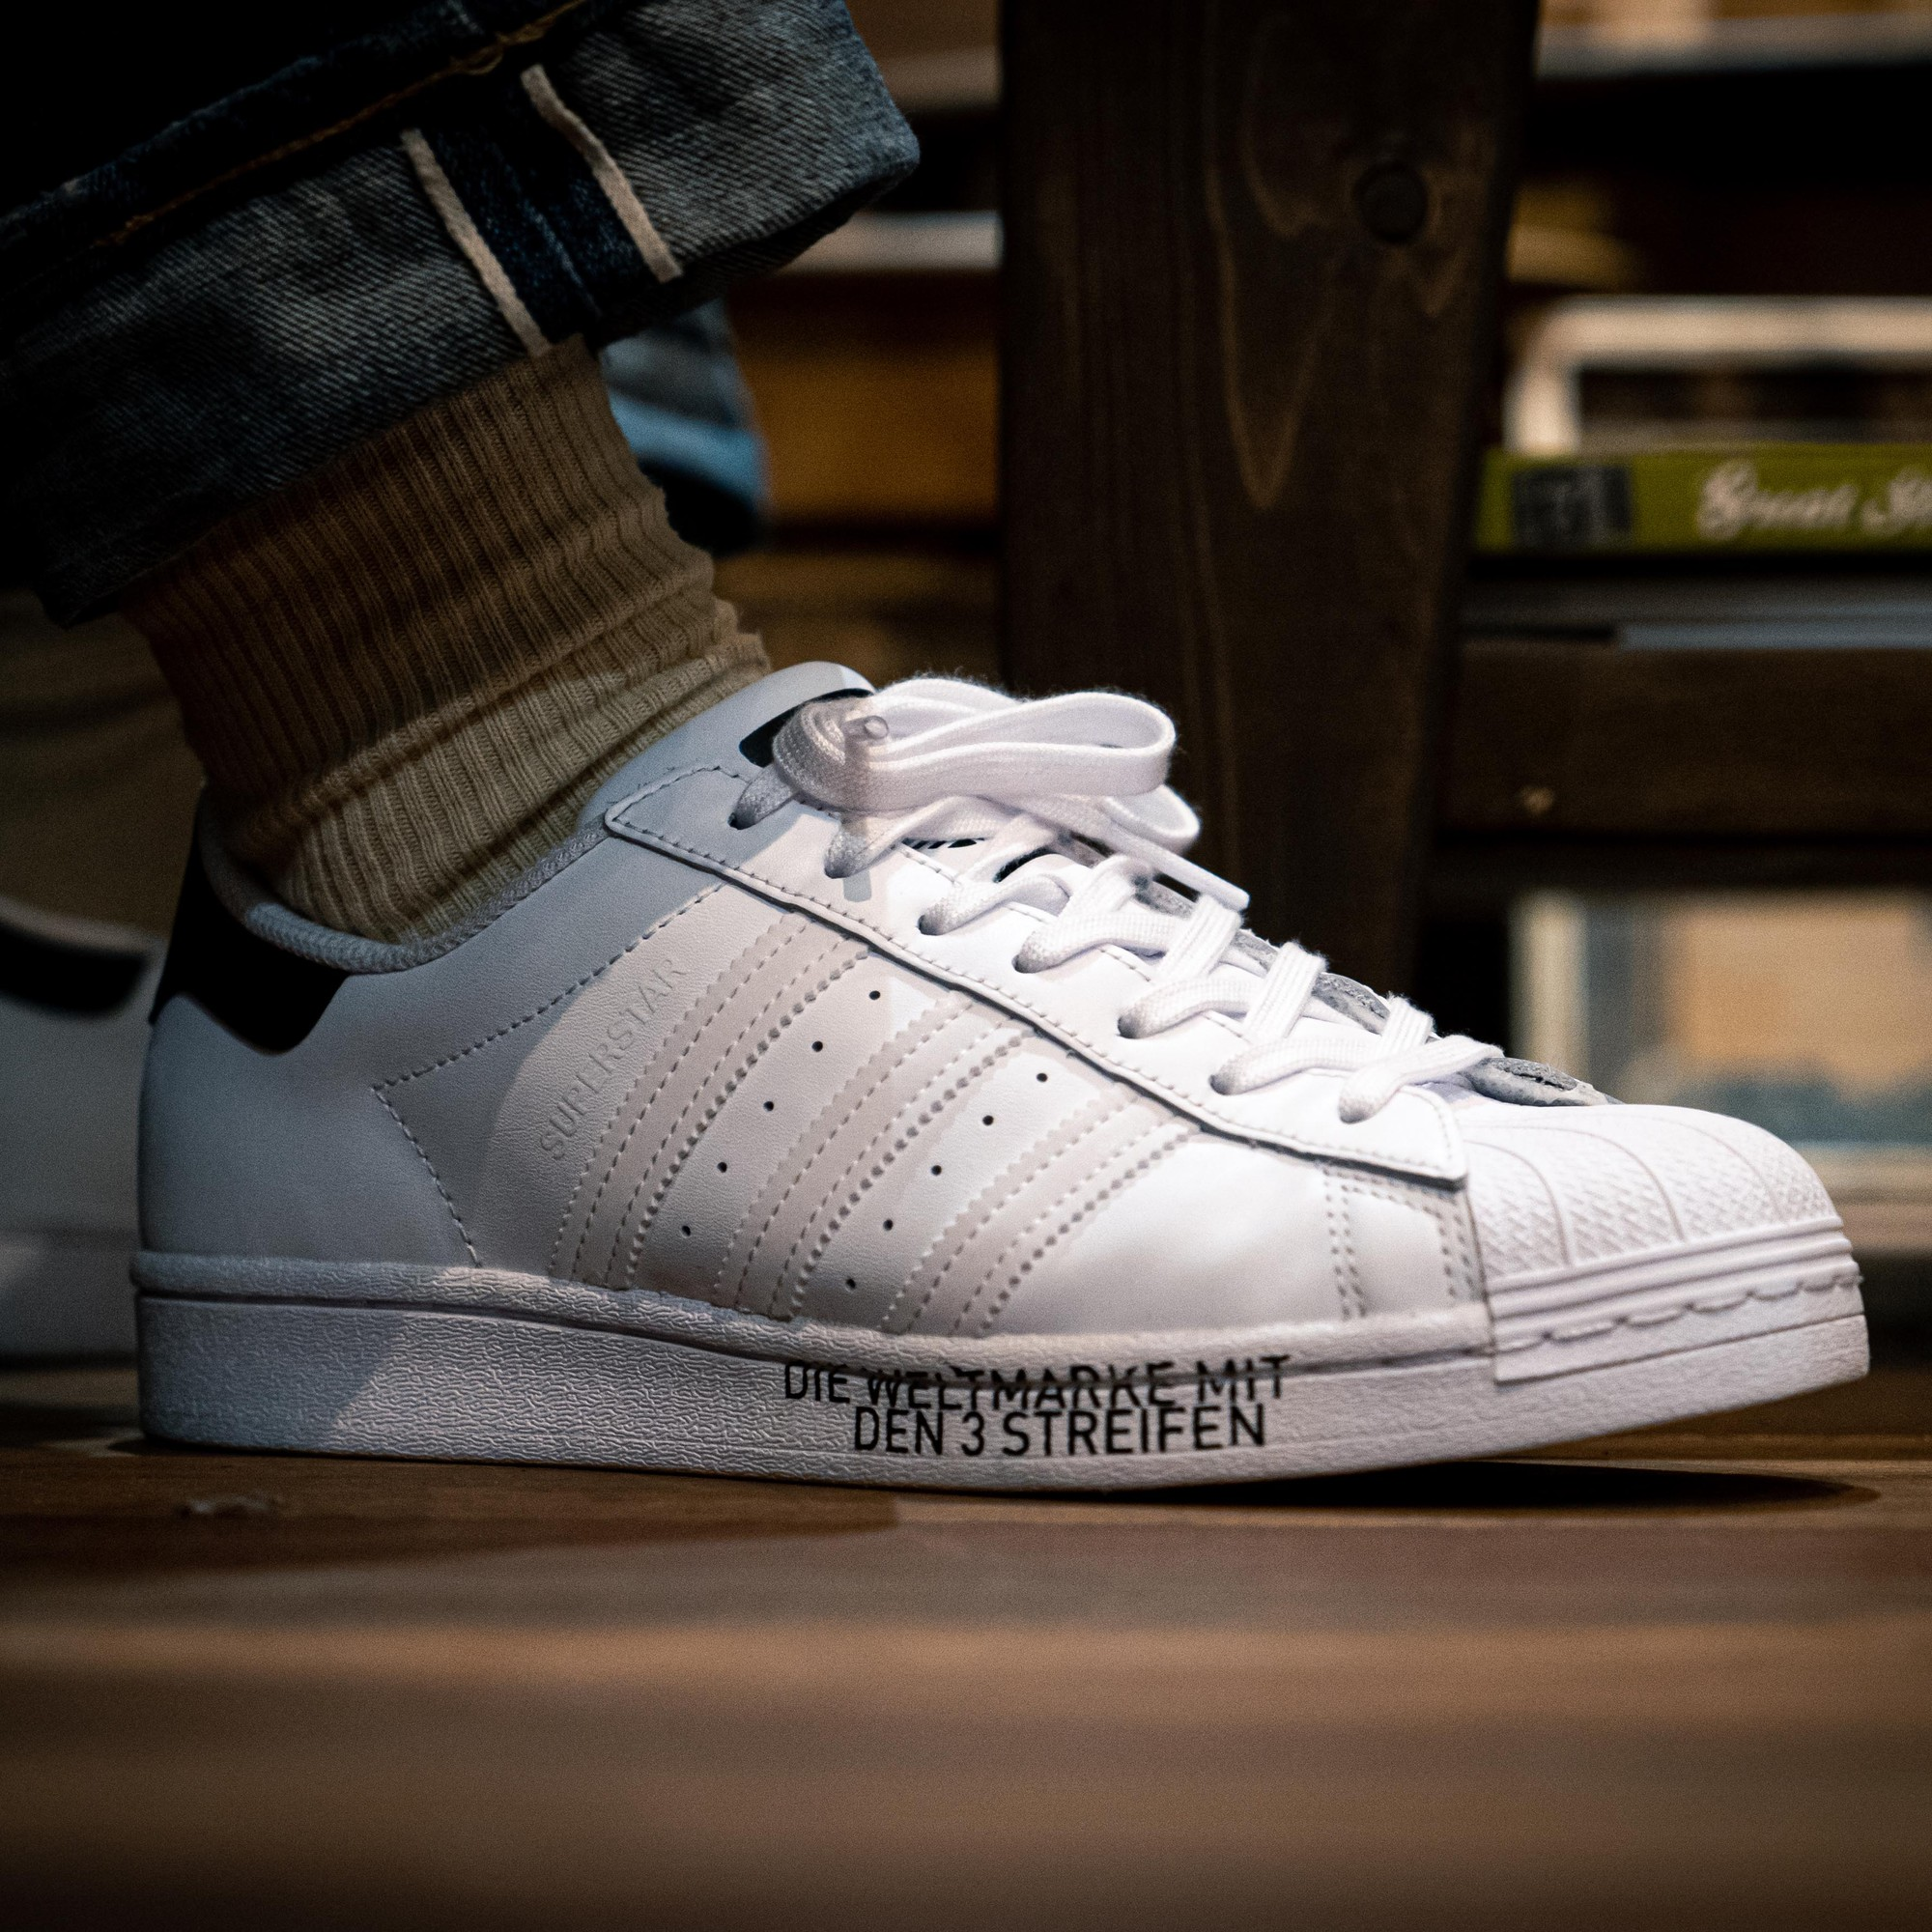 從 adidas Originals Superstar 看球鞋時尚文化的形成|BUYER'S GUIDE